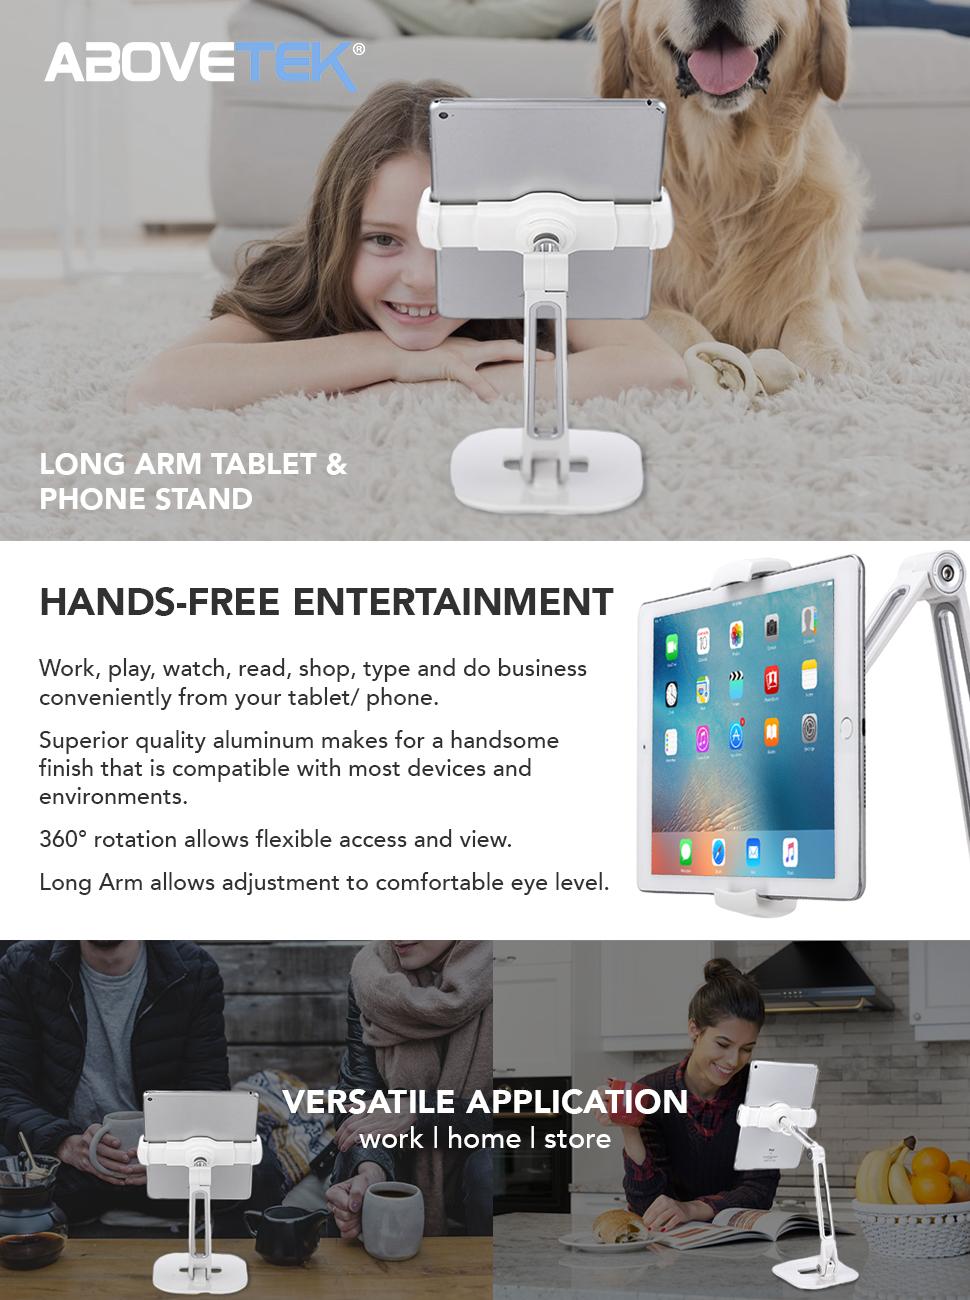 Amazon.com: AboveTEK Long Arm Aluminum Tablet Stand, Folding iPad ...